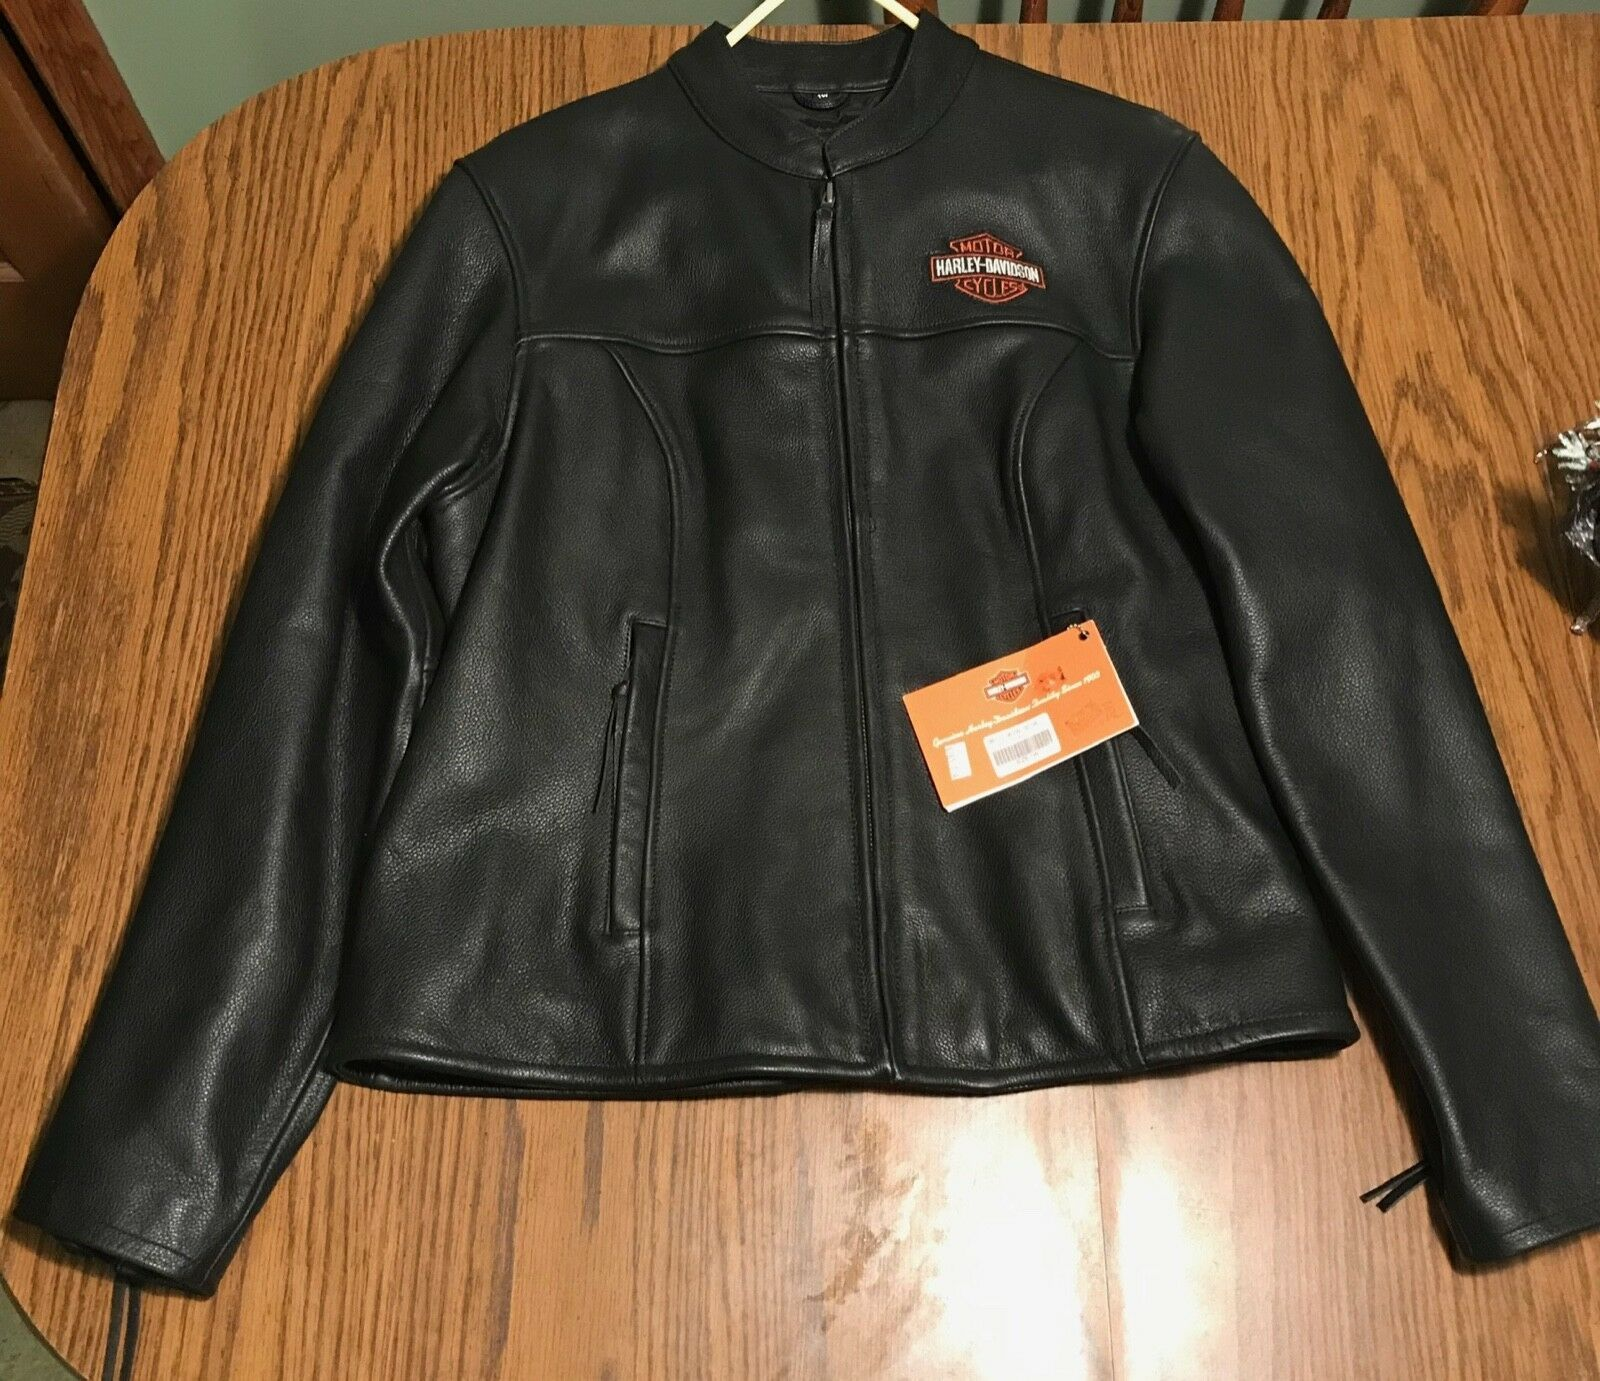 Forsale At 122 Women S Harley Davidson 1w Leather Jacket Woman Leather Jacket Leather Jacket Leather Jackets Women Velvet Blazer Women [ 1381 x 1600 Pixel ]